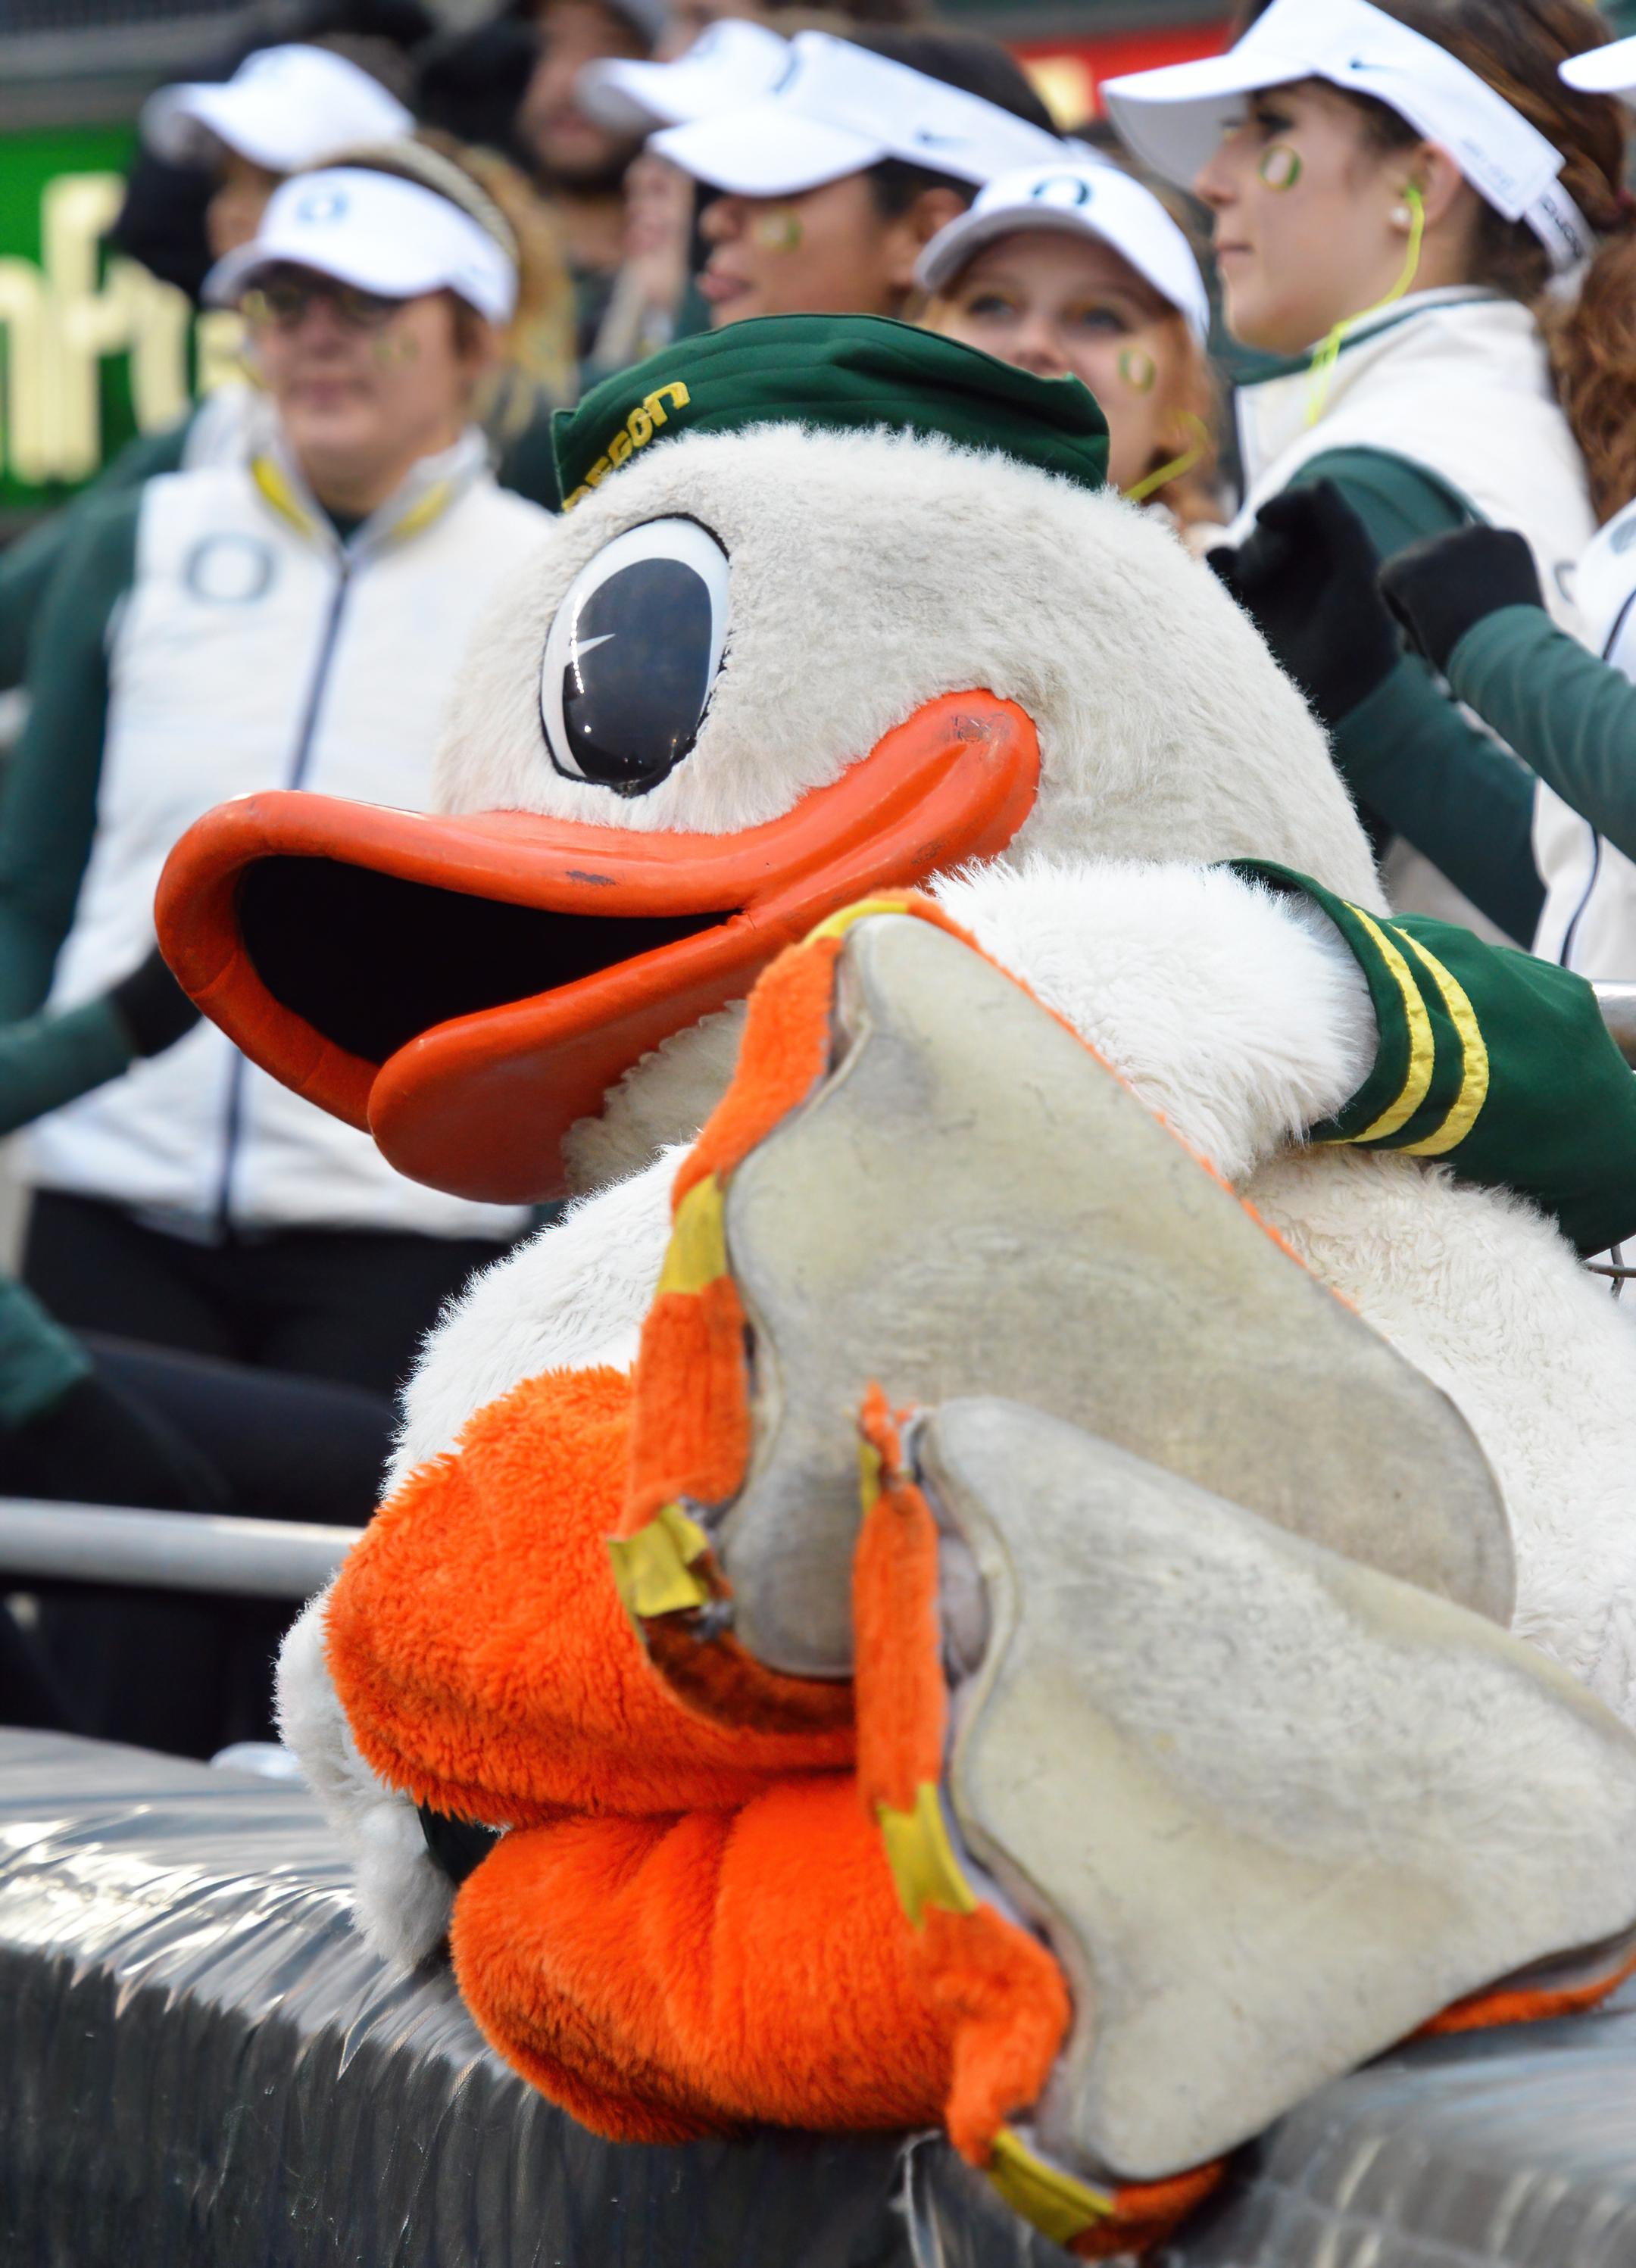 The Oregon Duck autzen stadium eugene topaz denoise ai-low-light